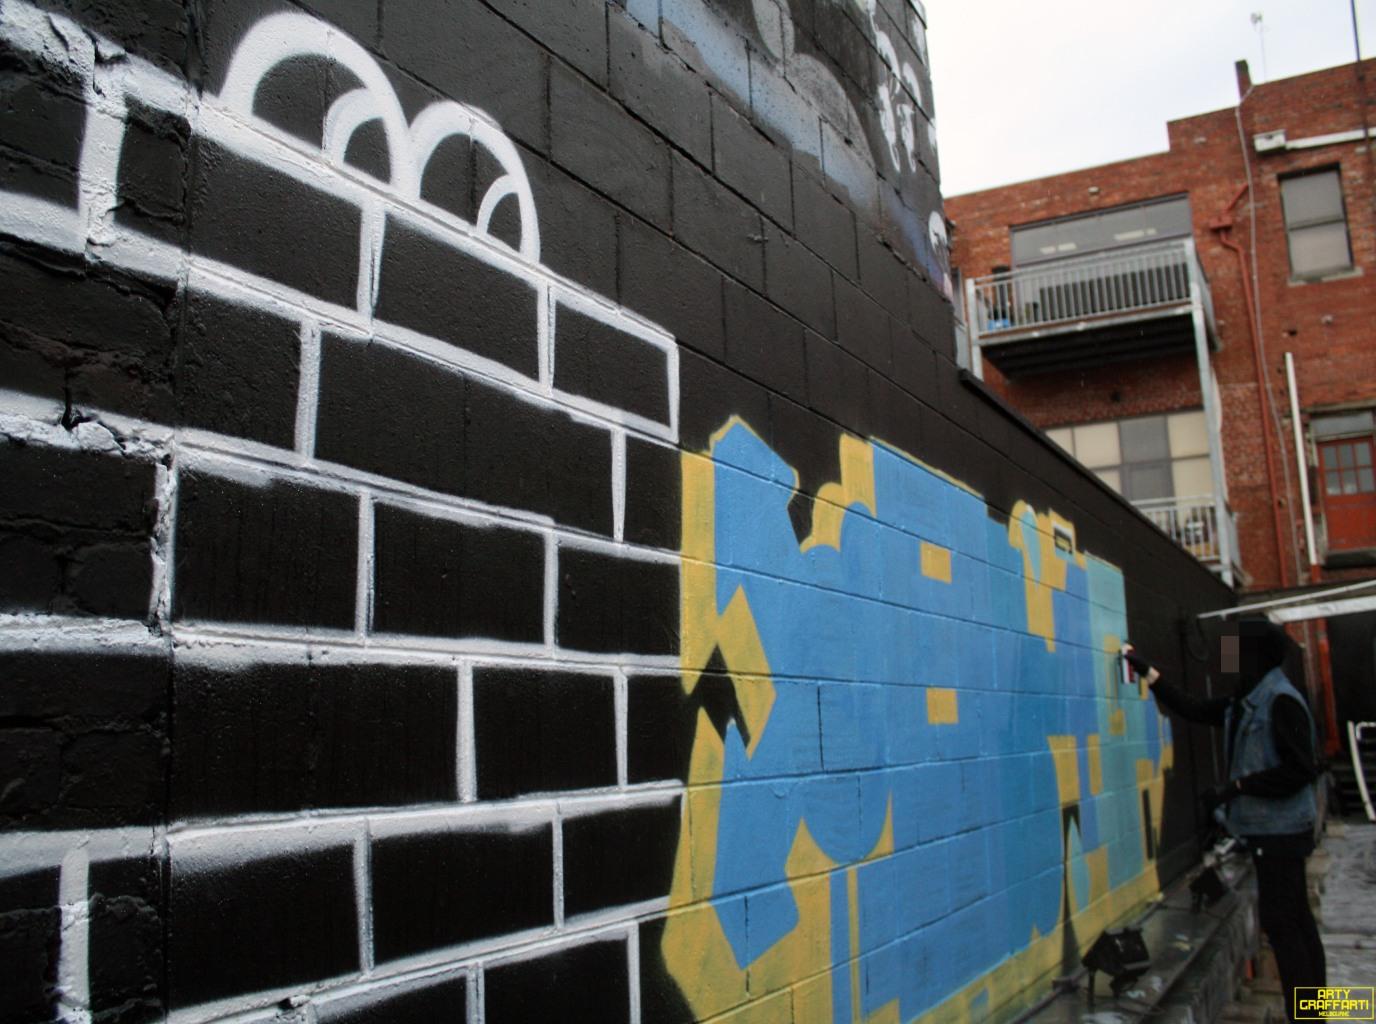 Revolver Upstairs Prahran Flies OG23 Skary Seasons of Change Winter Melbourne Graffiti Arty Graffarti4